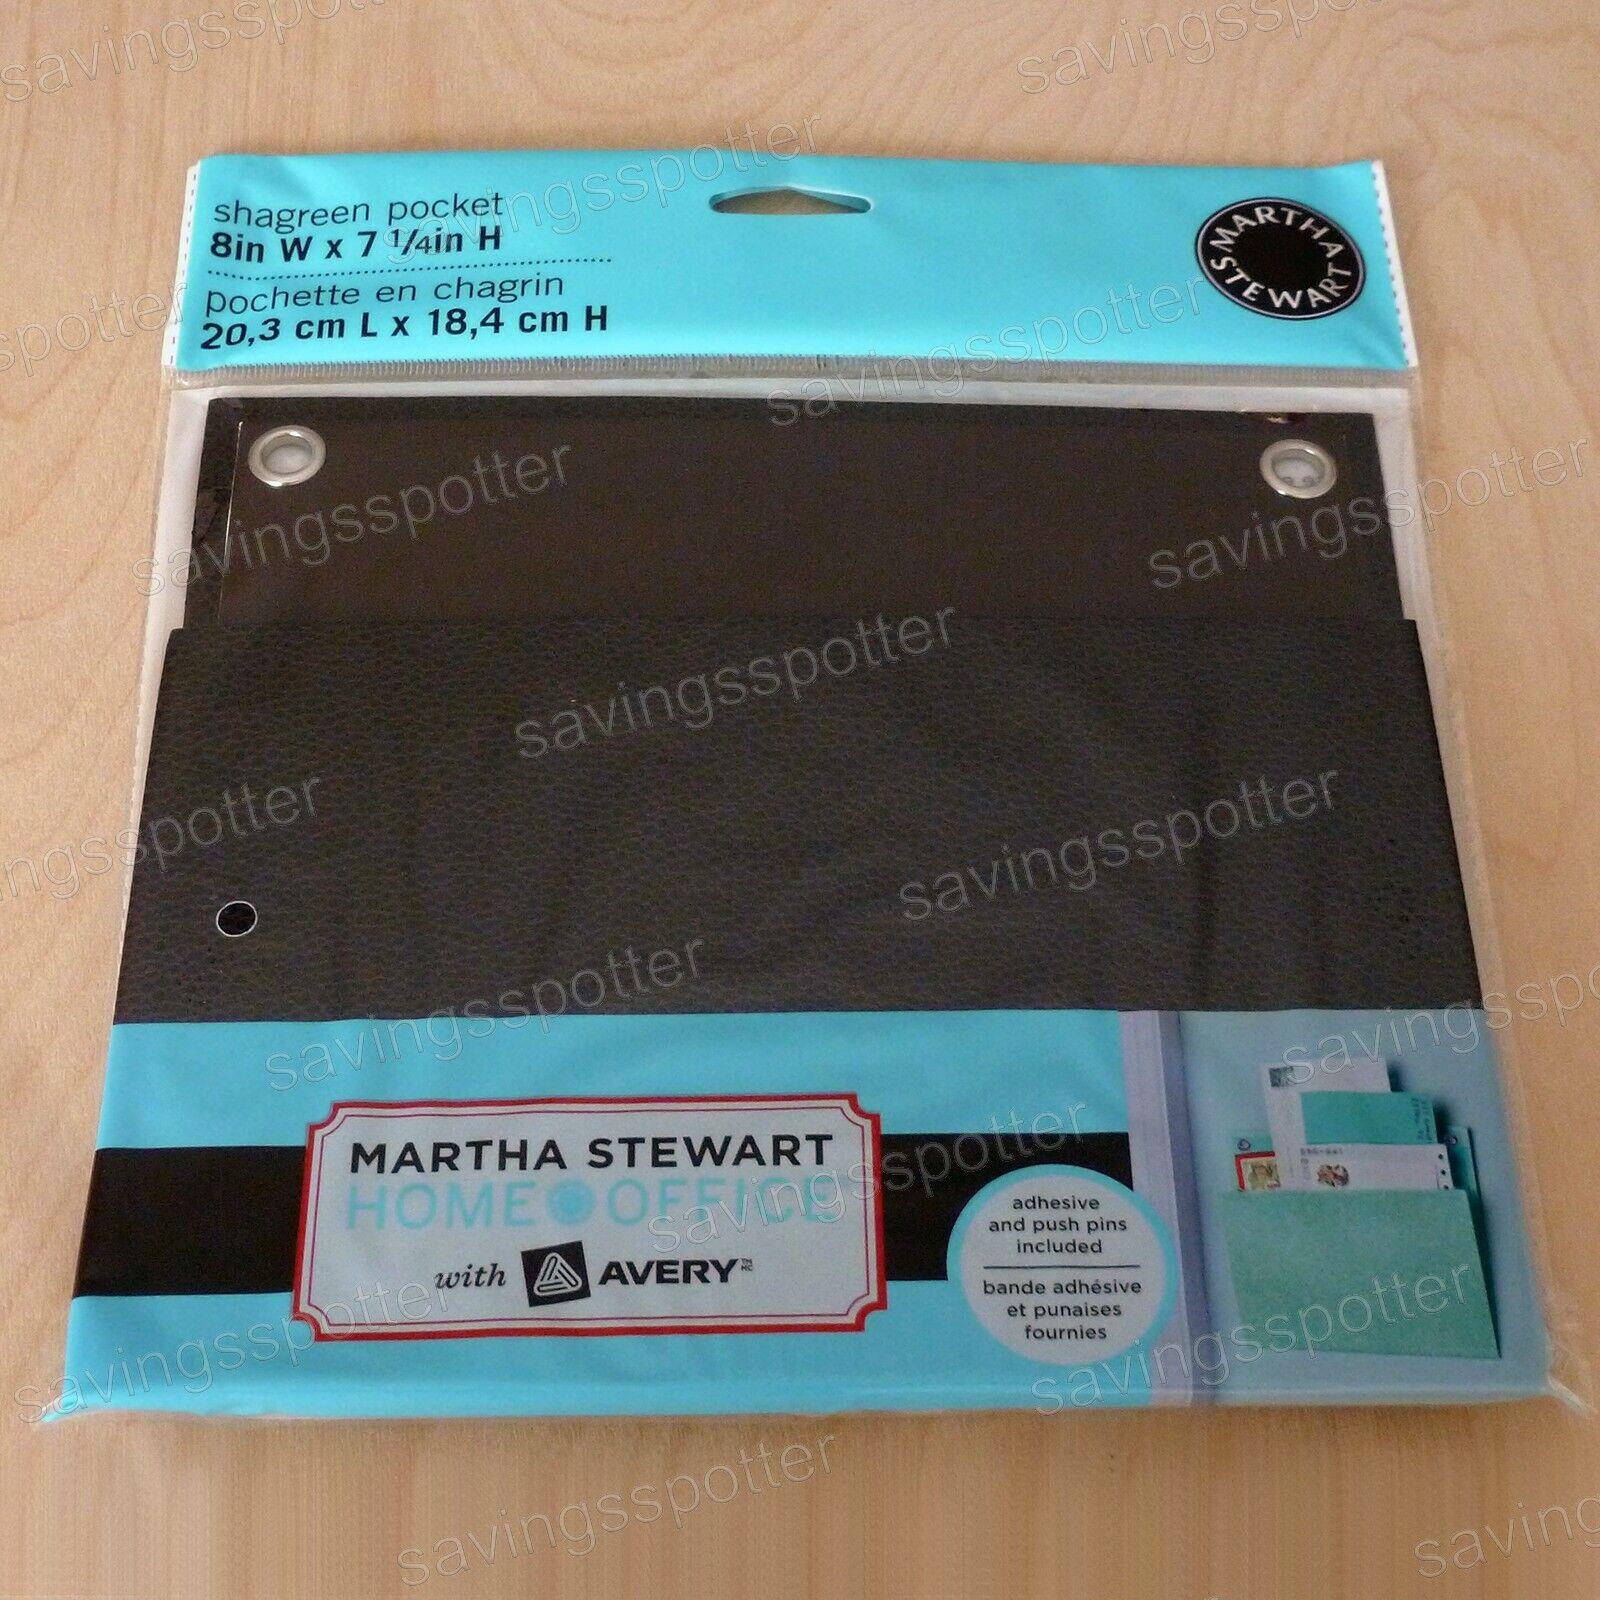 "Martha Stewart Home Office Avery LARGE Shagreen Wall Pocket 12/"" x 10-1//4/"" Mint"